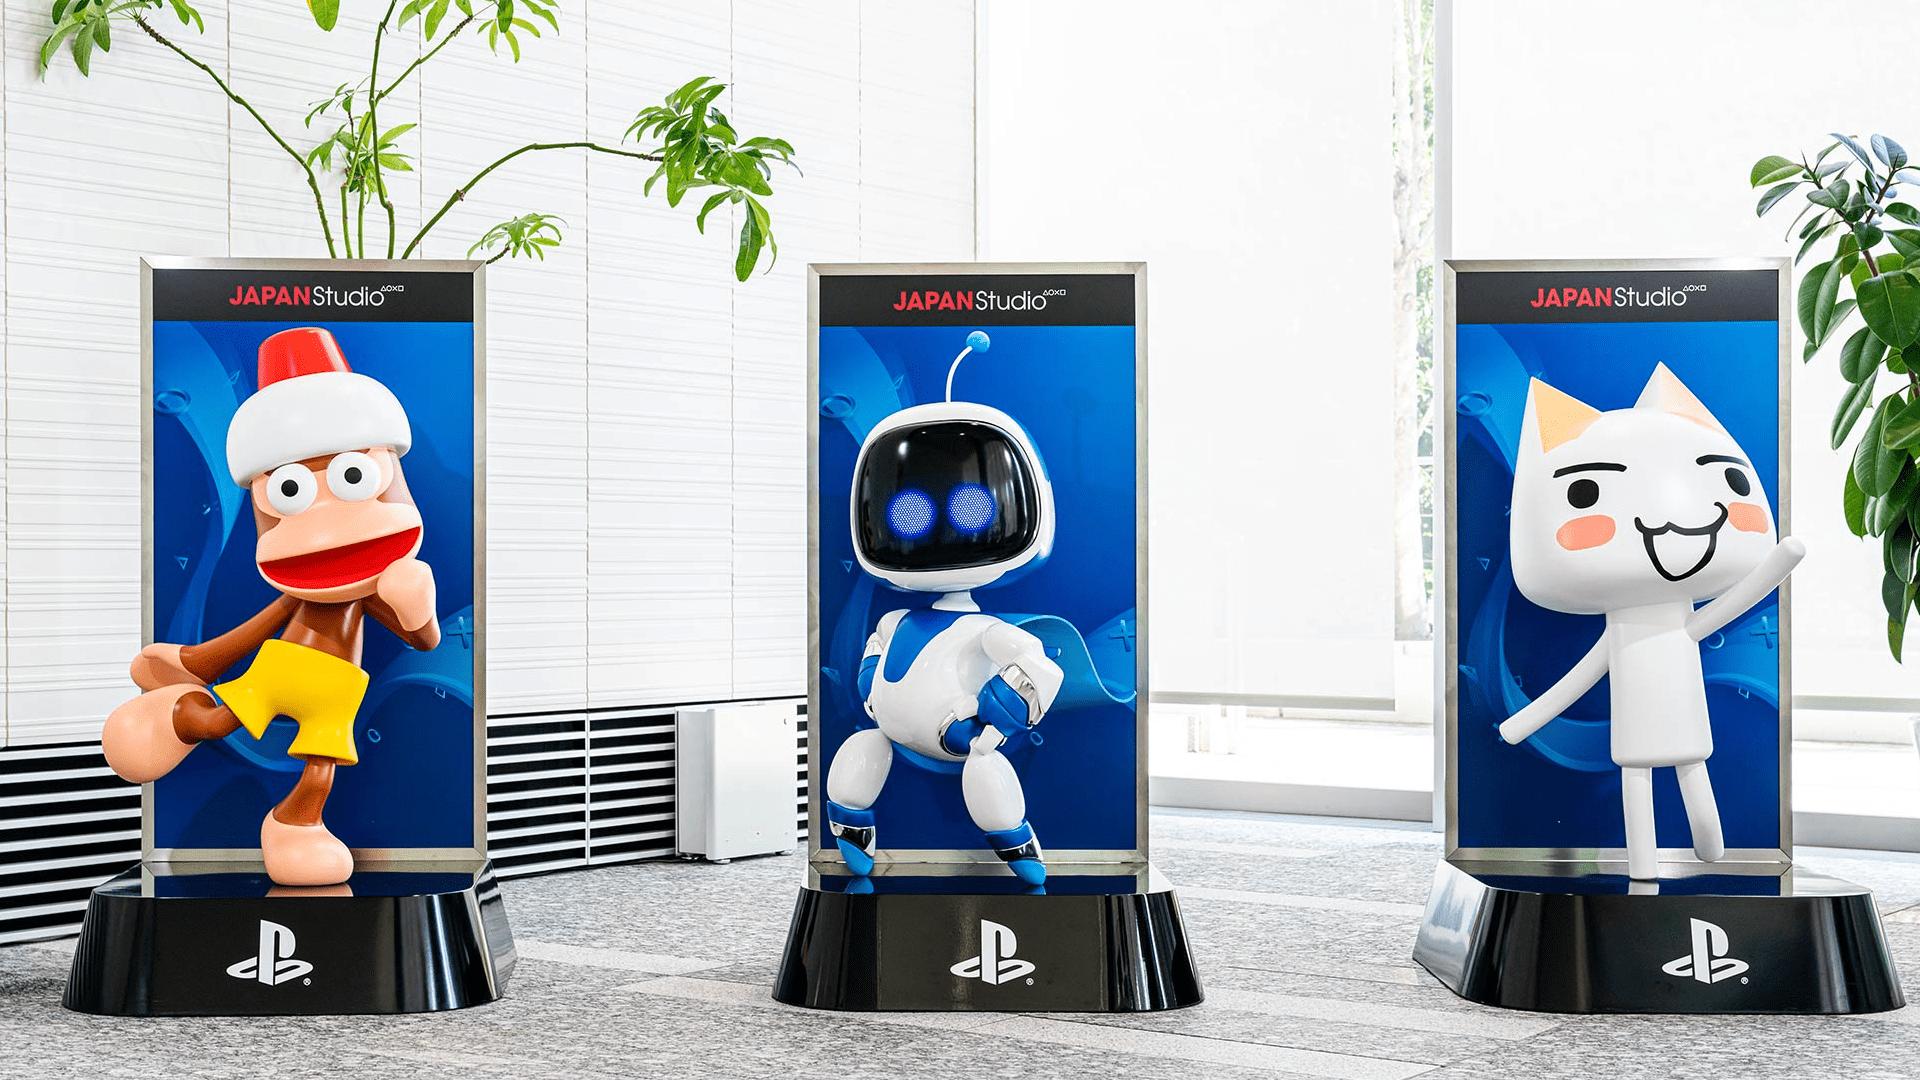 PlayStation editoriale japan studio